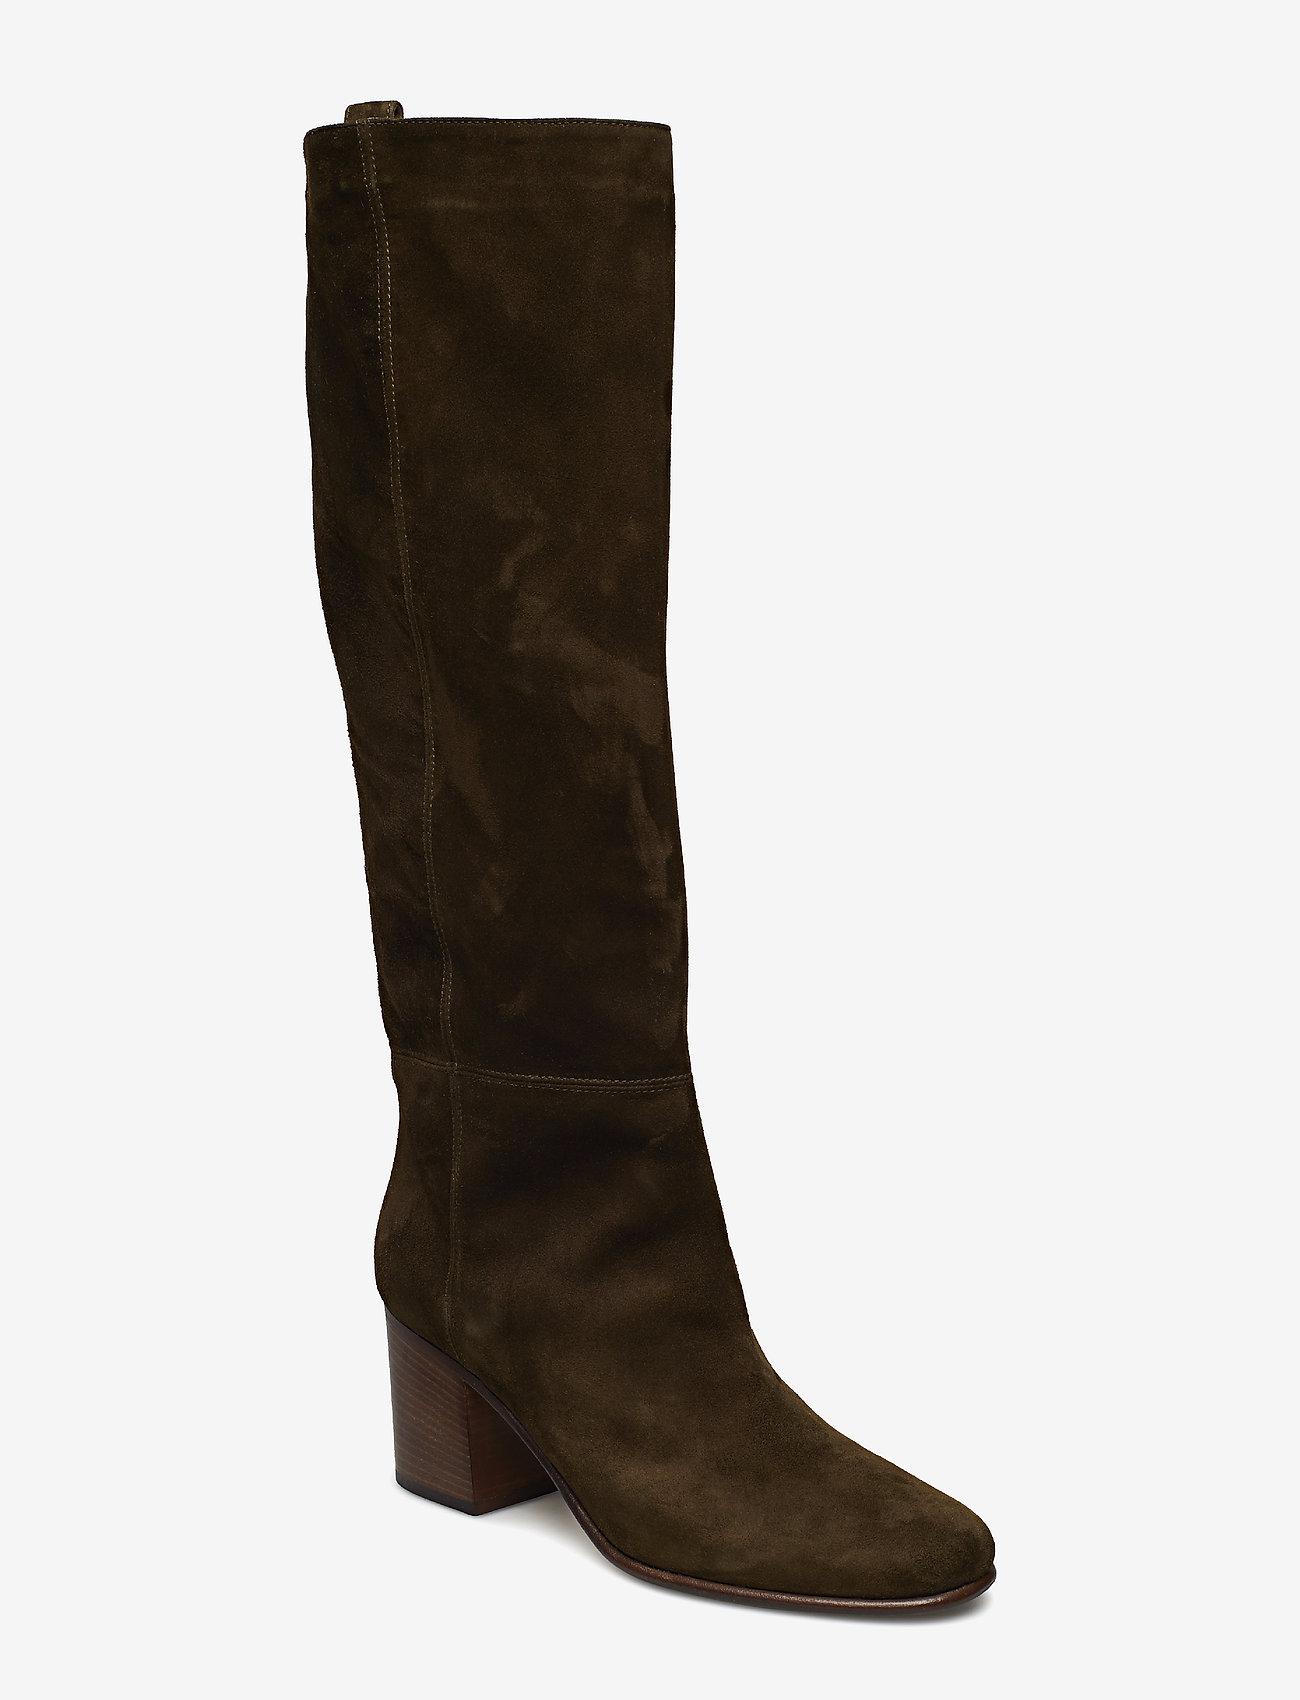 NOTABENE - Samara - høye boots - green suede - 0